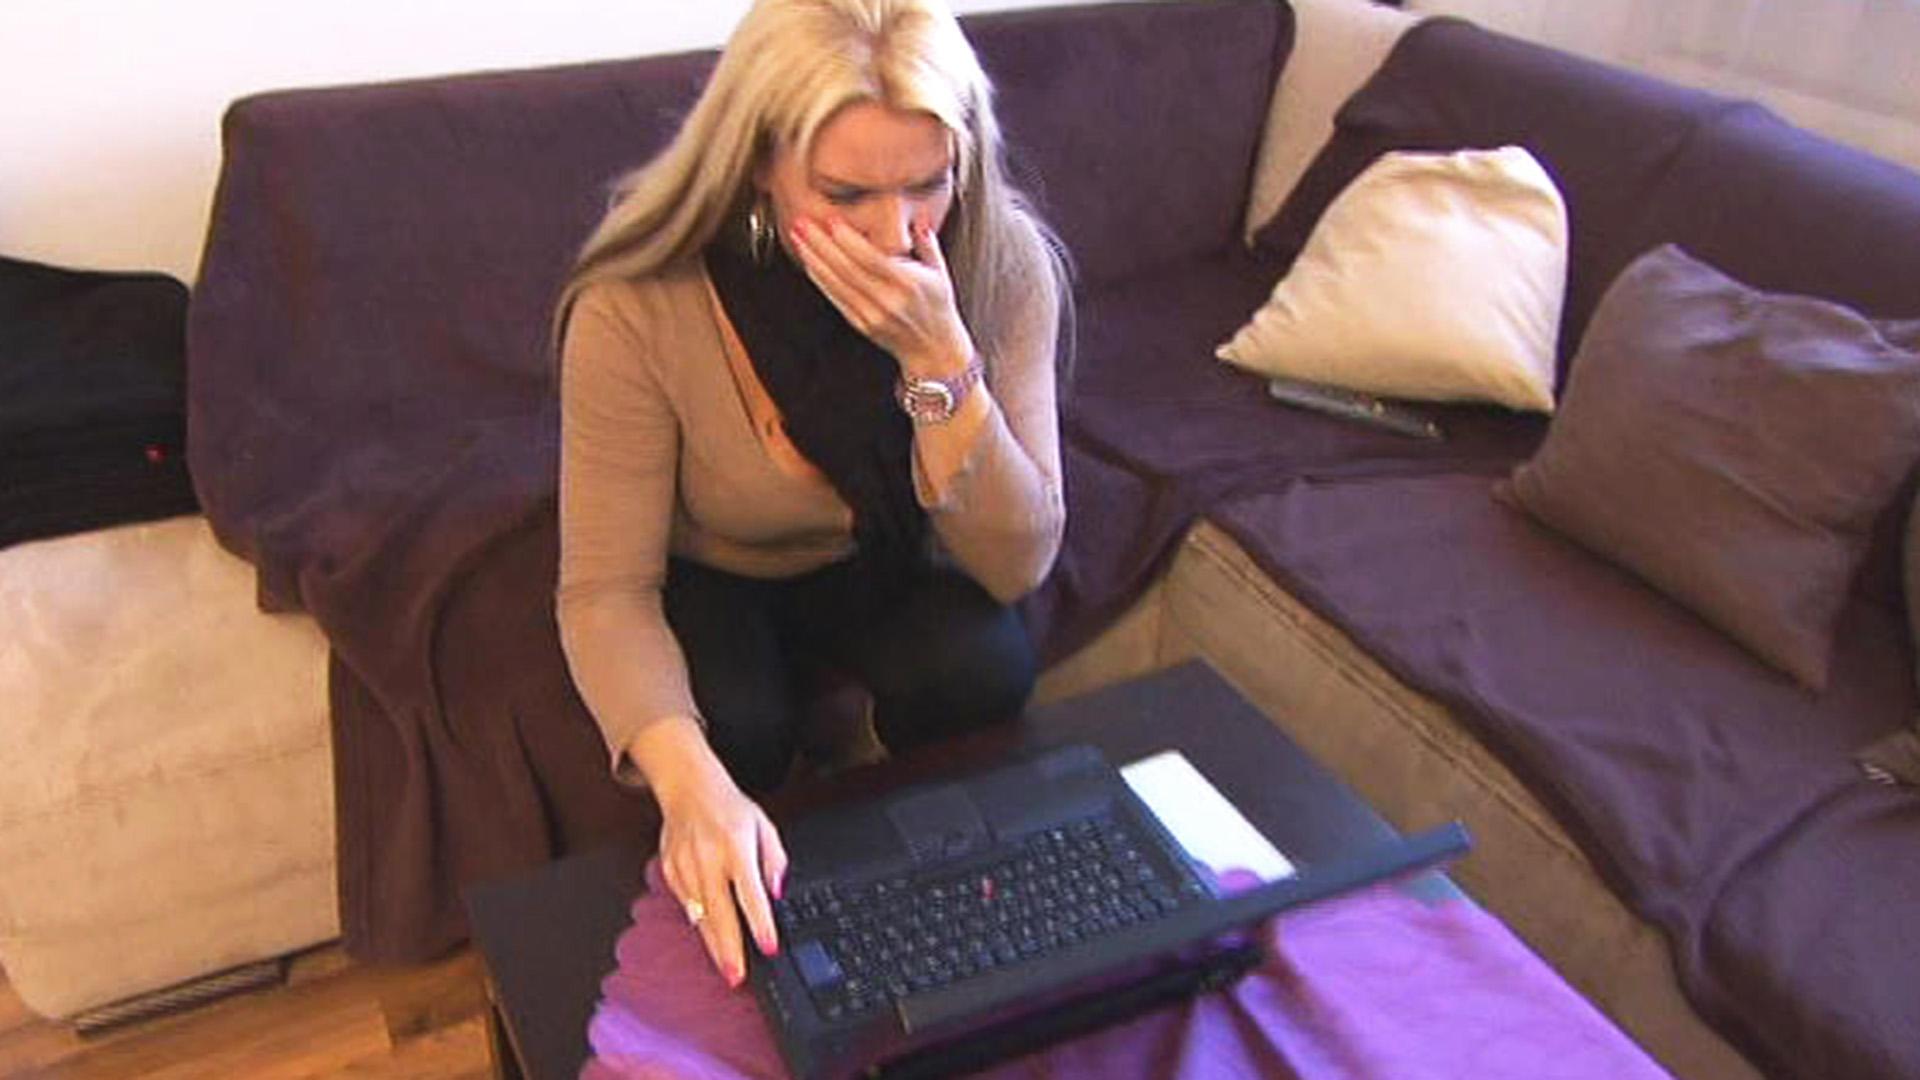 Frau blamiert Familie in Internet-Forum | Folge 118